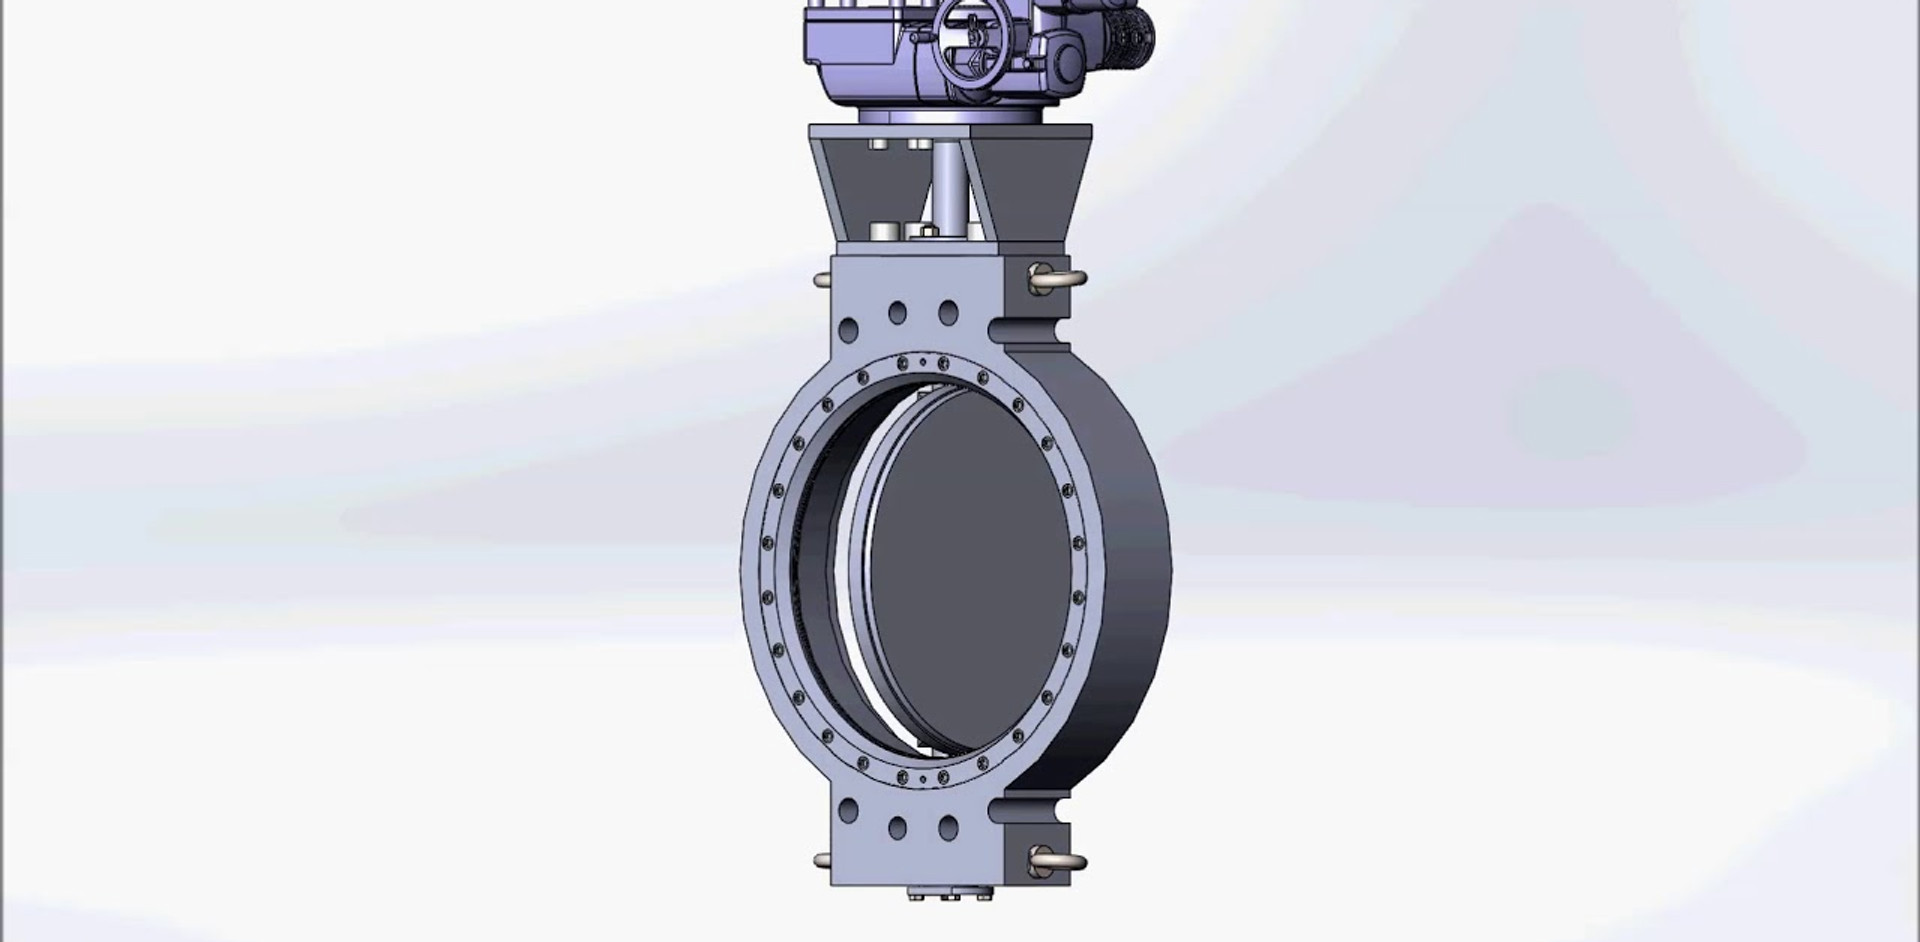 Butterfly valve 3D sample with AUMA actuator